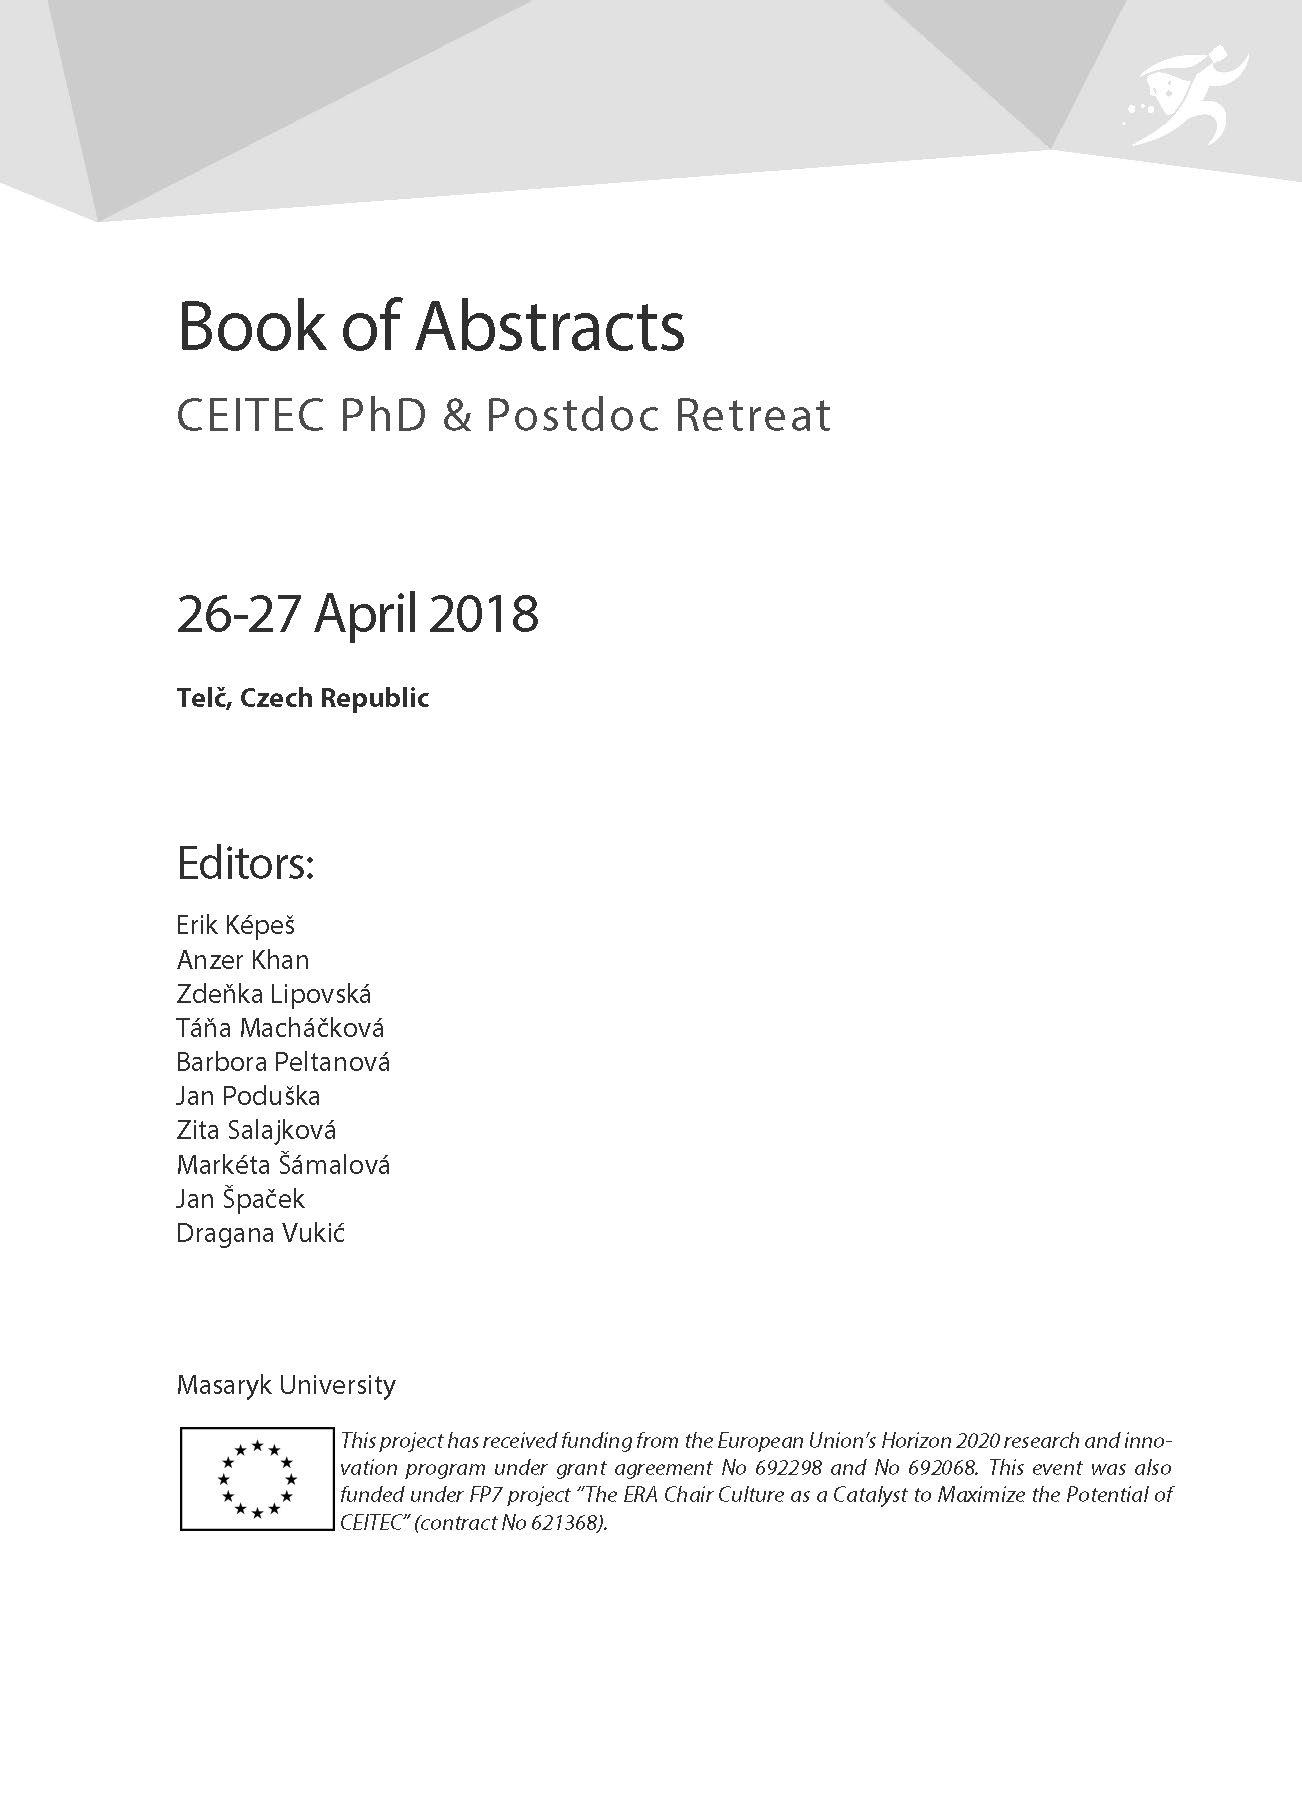 Obálka pro CEITEC PhD & Postdoc Retreat. Book of Abstracts